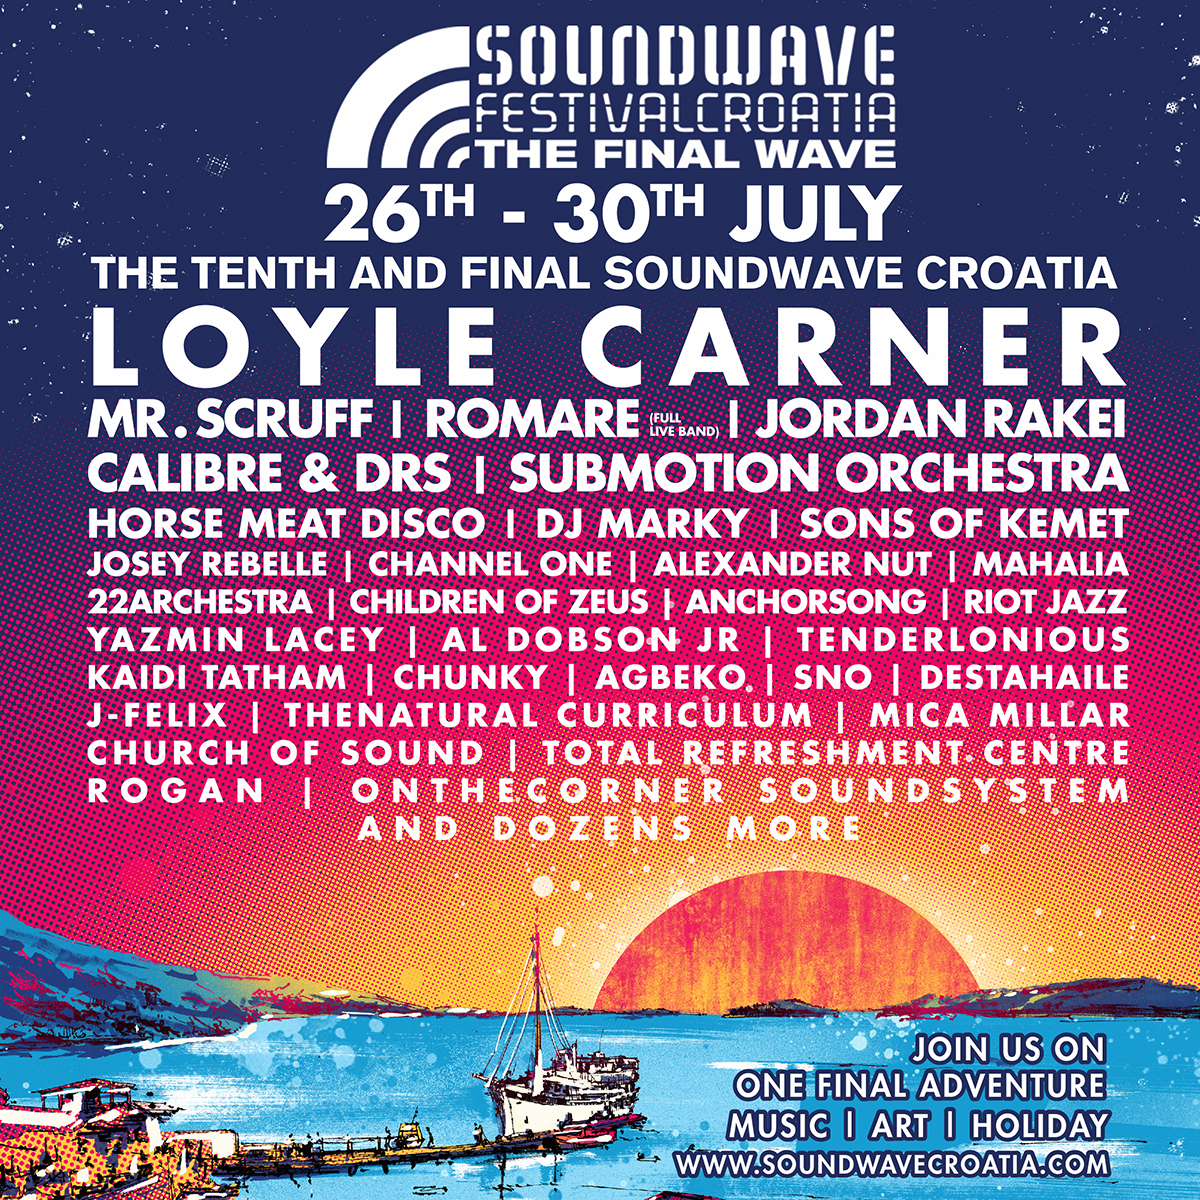 Soundwave 2018 Line-Up